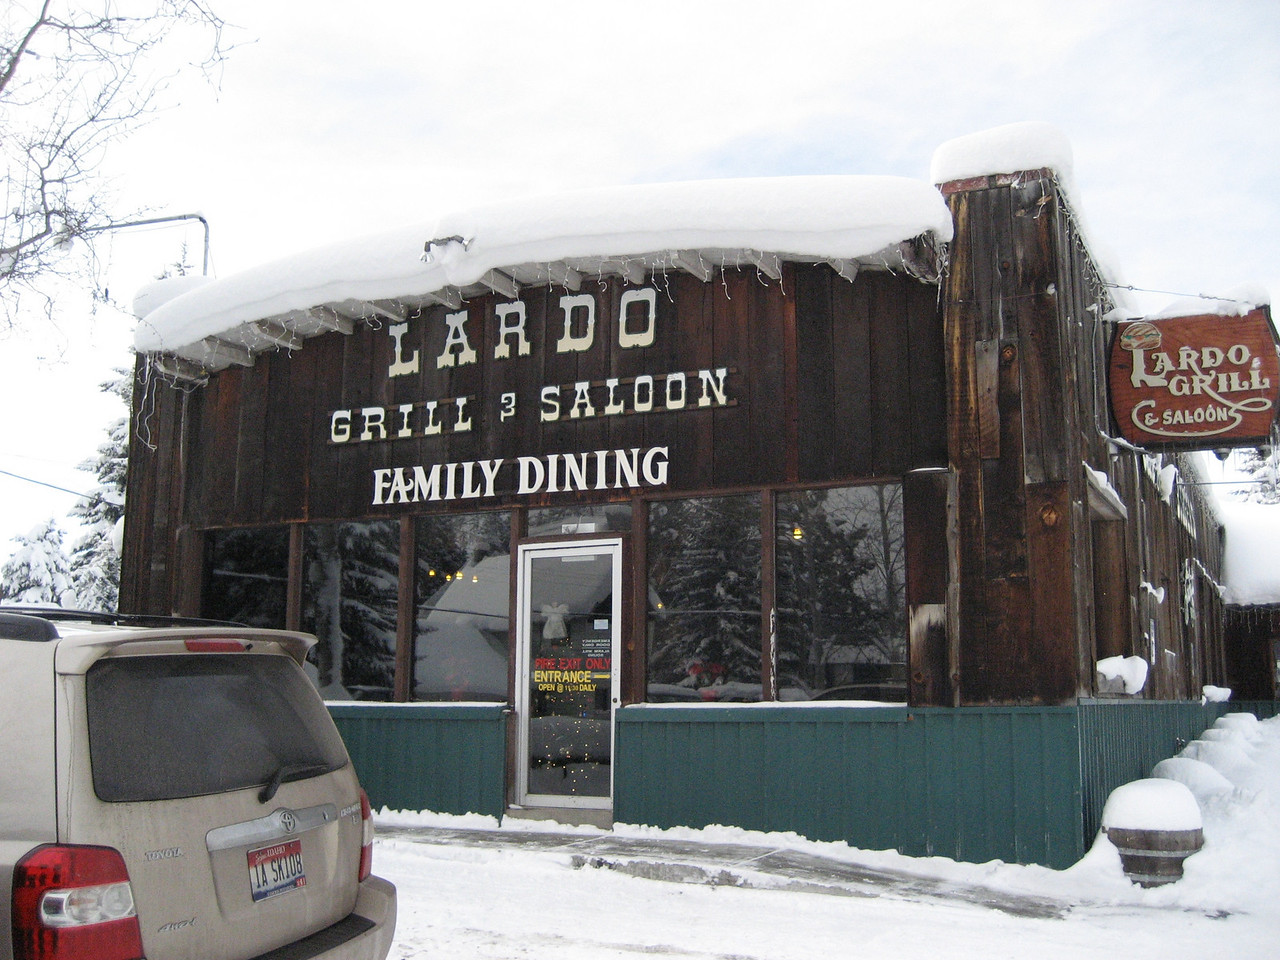 Lardo Grill & Saloon excellent hamburgers